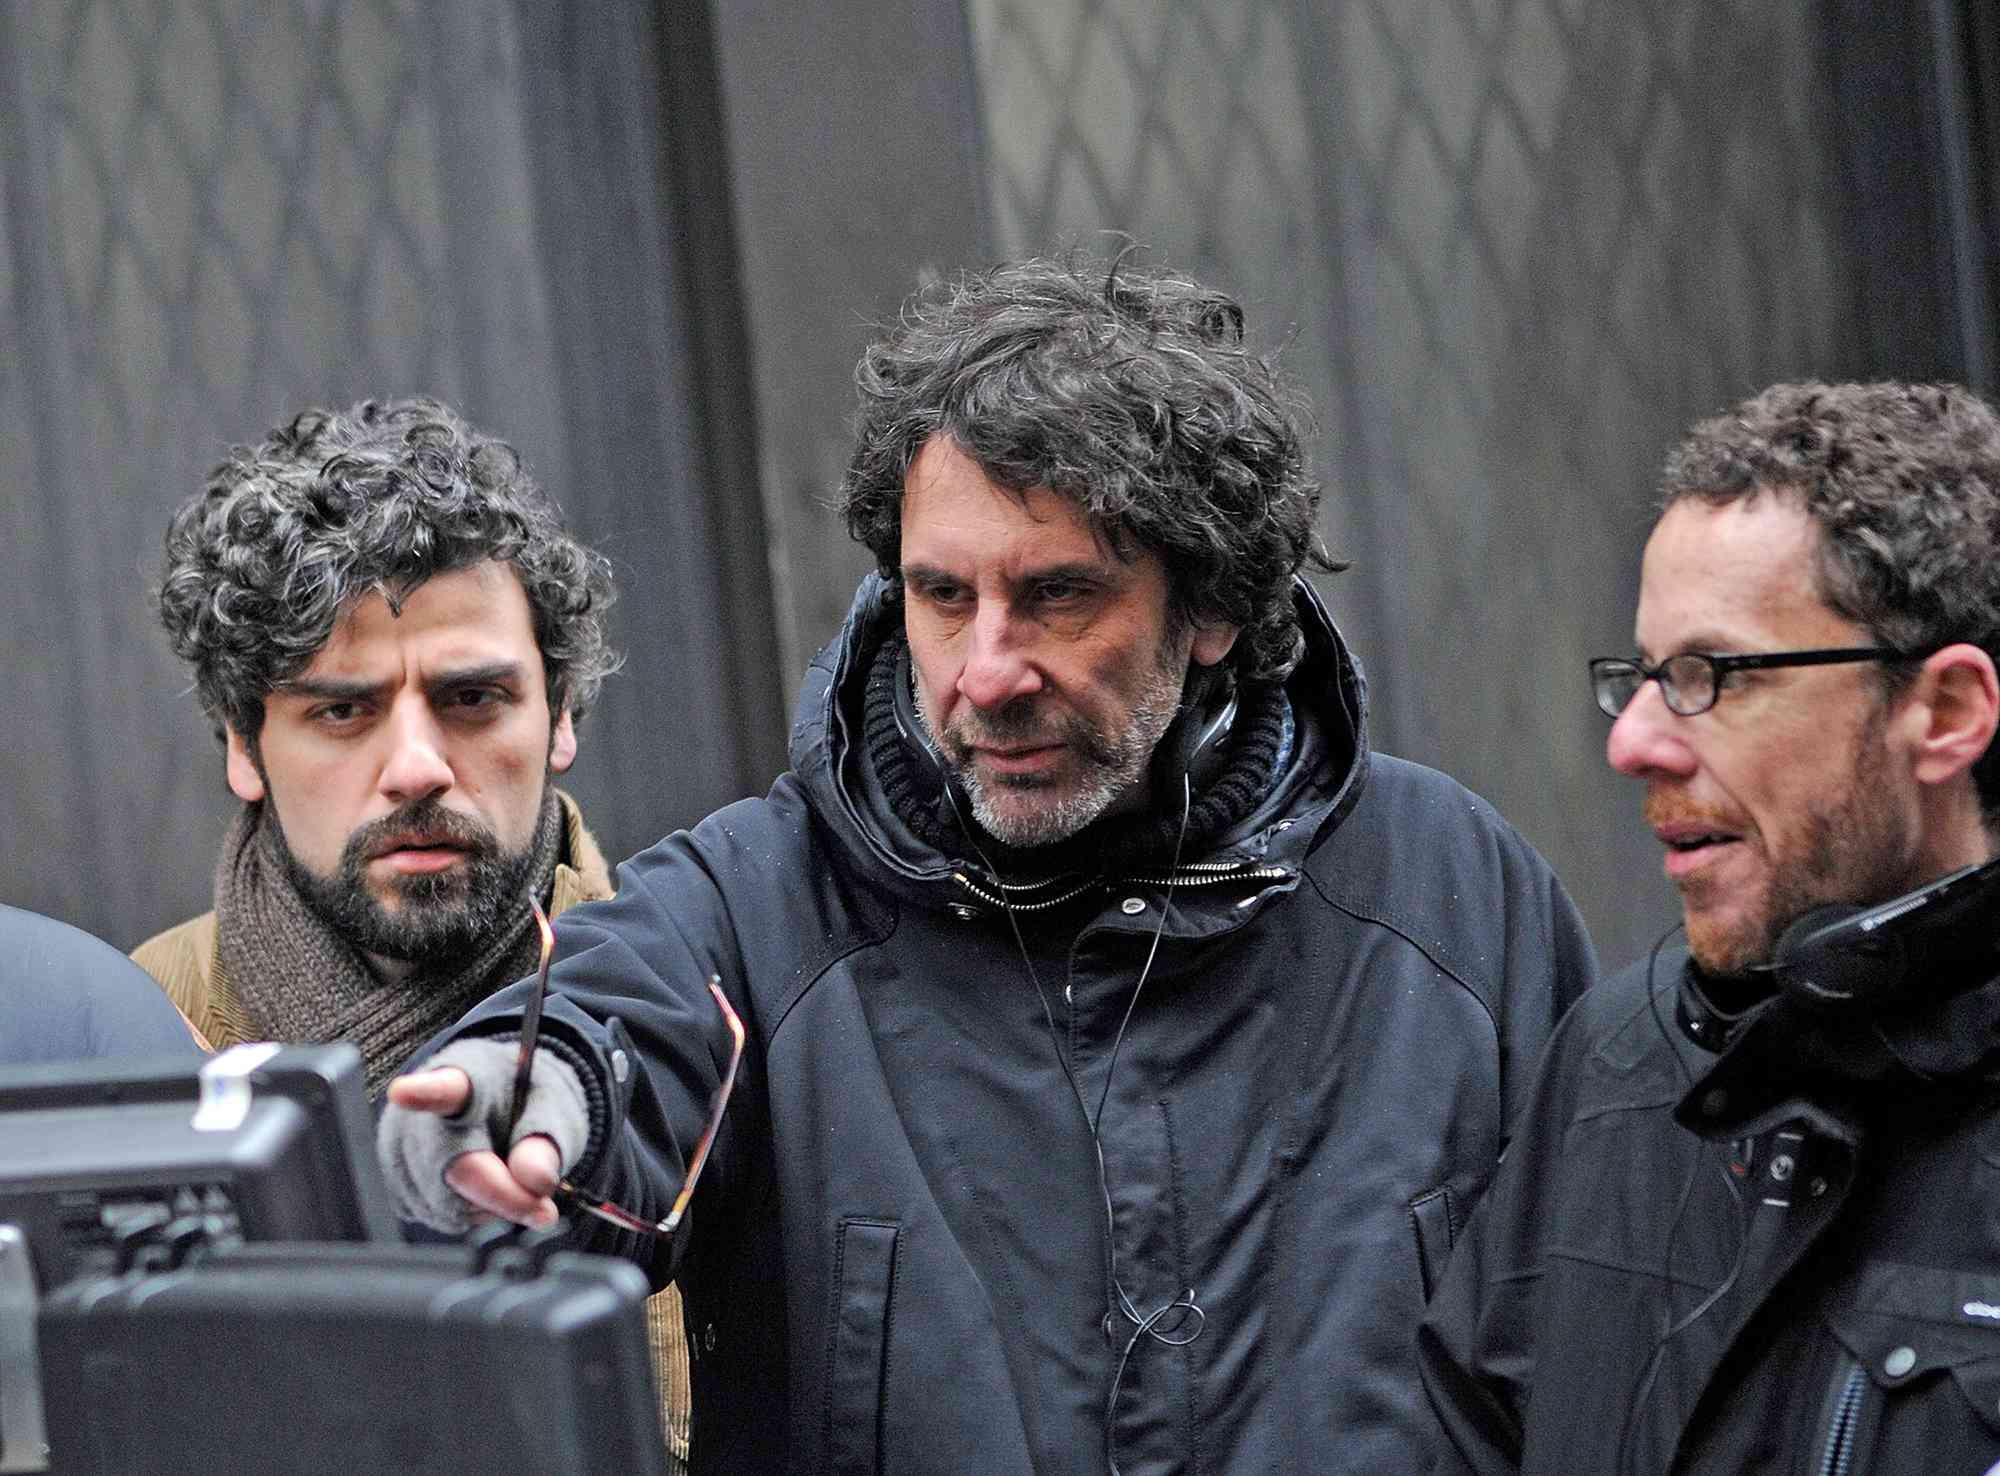 Actor Oscar Isaac, Director Joel Coen and Director Ethan Coen